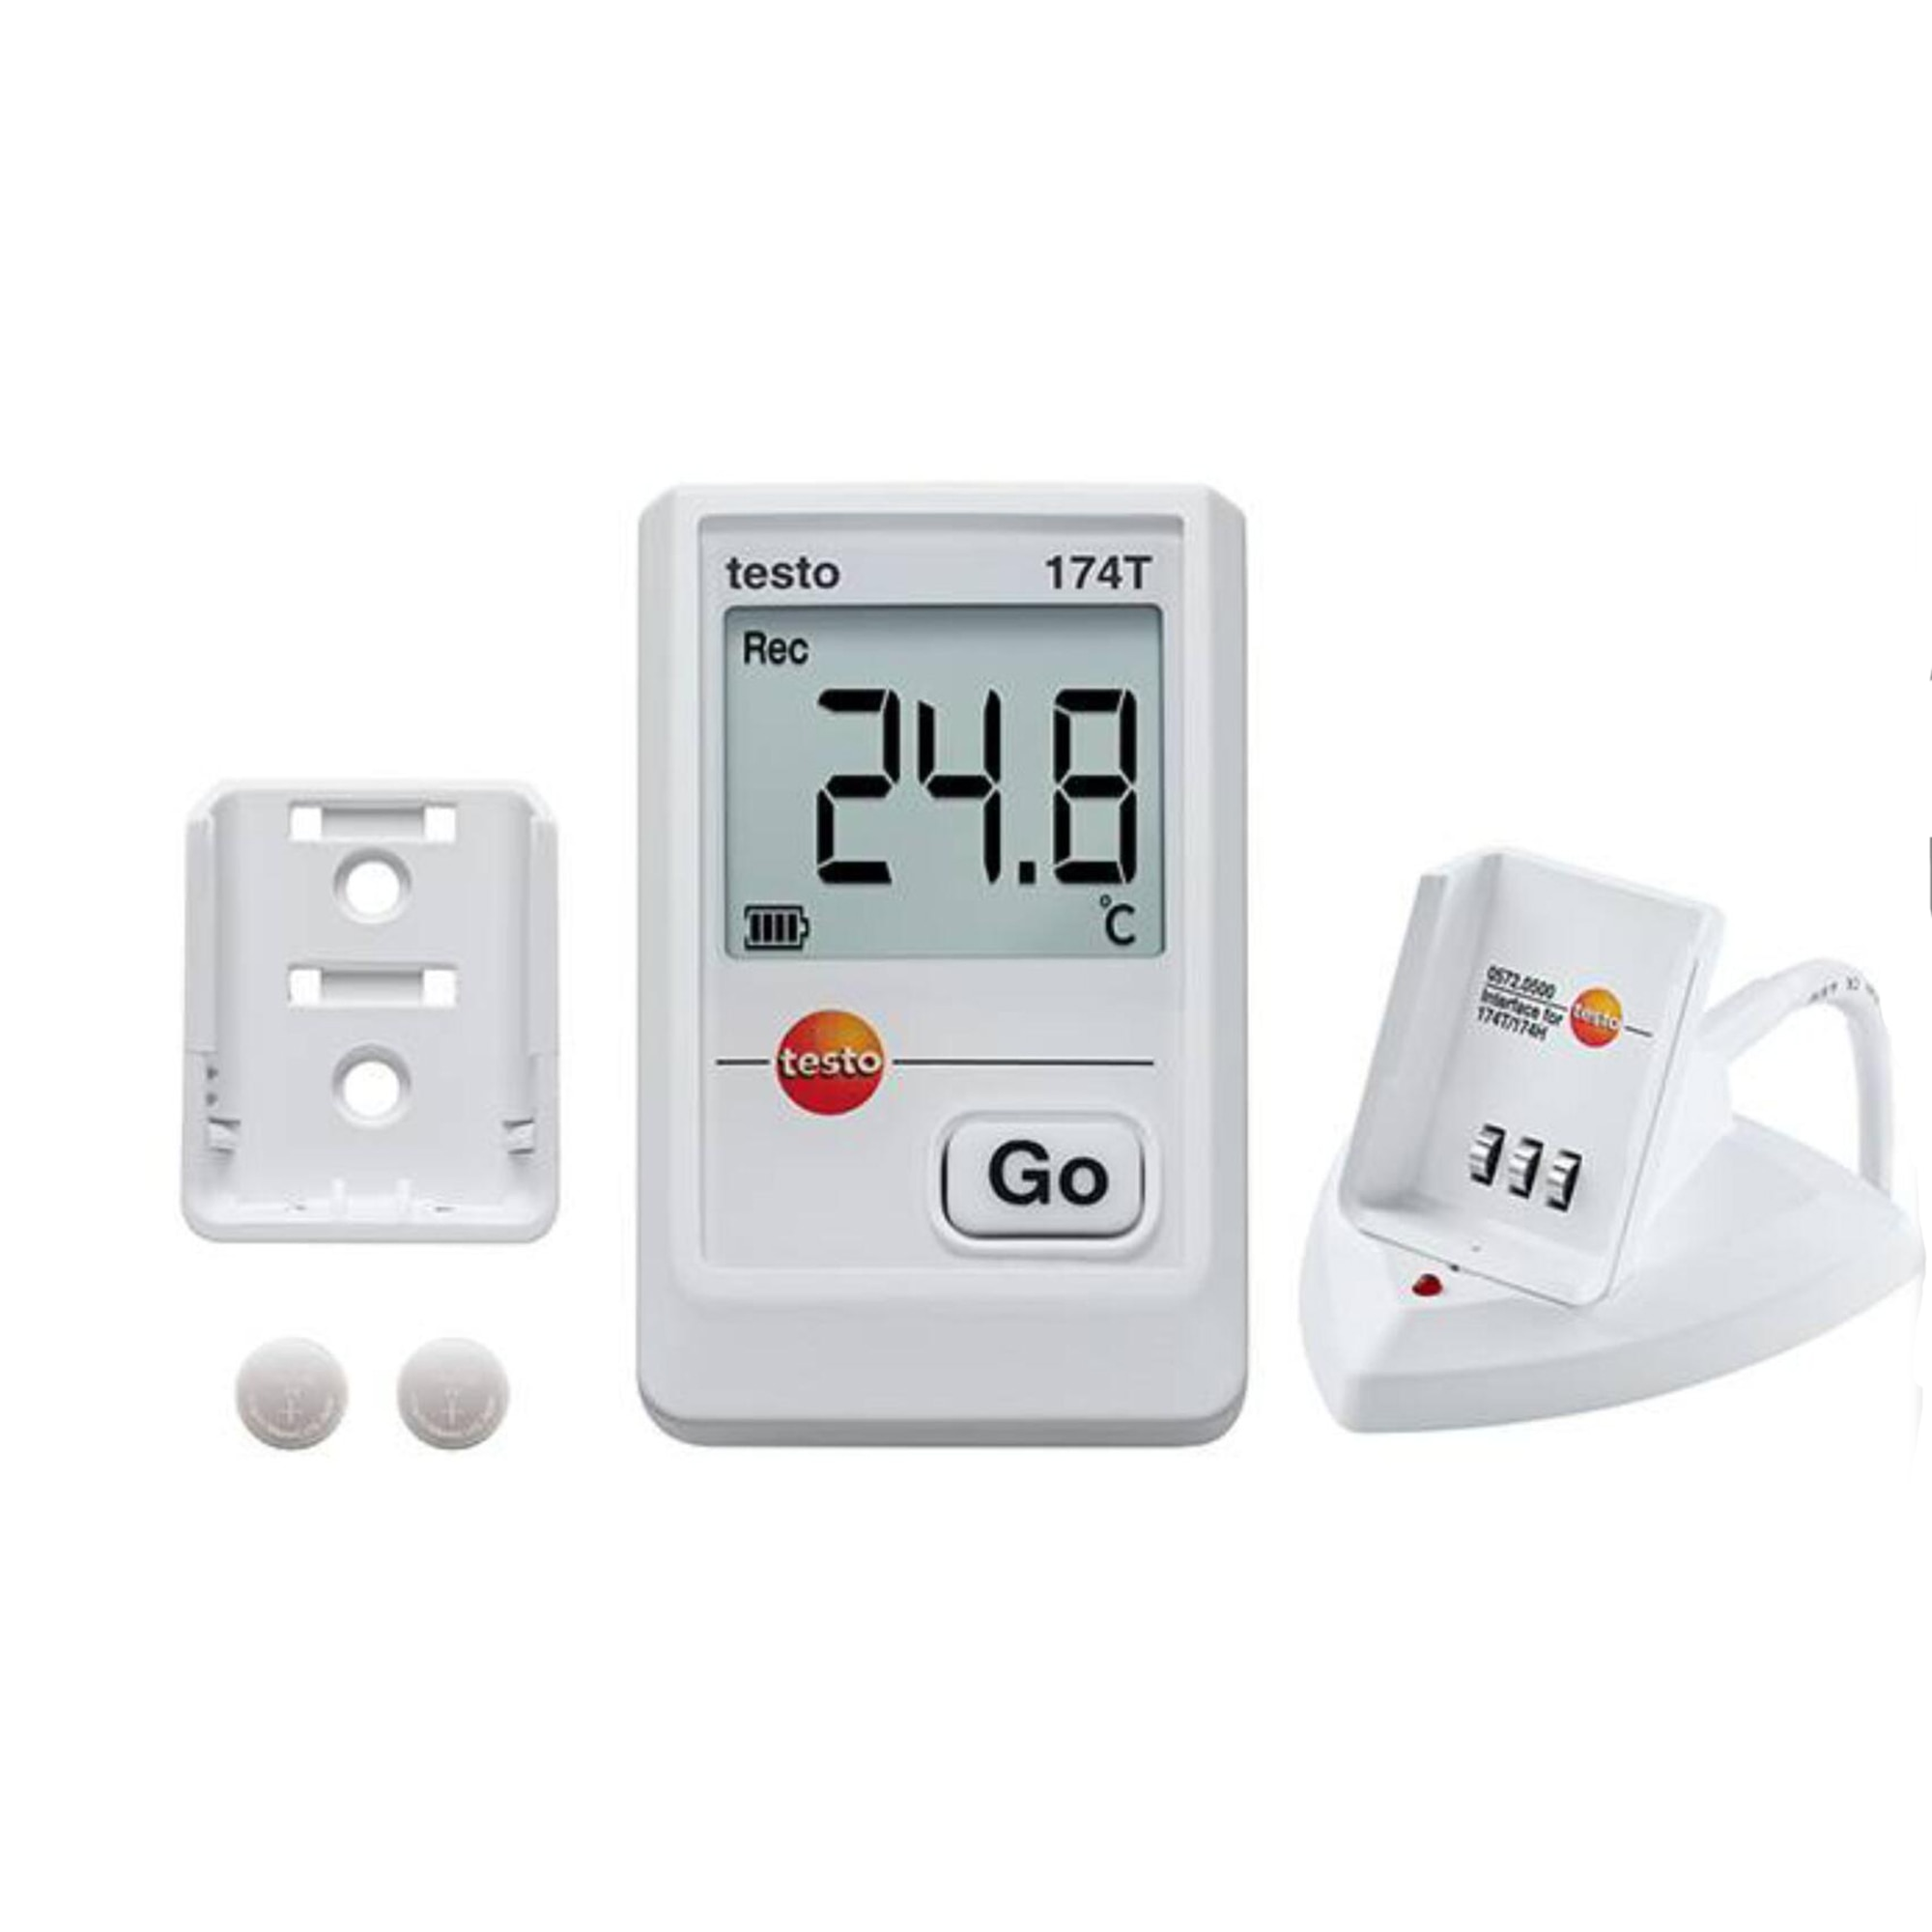 Testo174 T - Mini registrador de datos de temperatura kit de rango de medida-22 ° a 158 °F/de alta precisión sensor Termistor NTC 0572. 0561